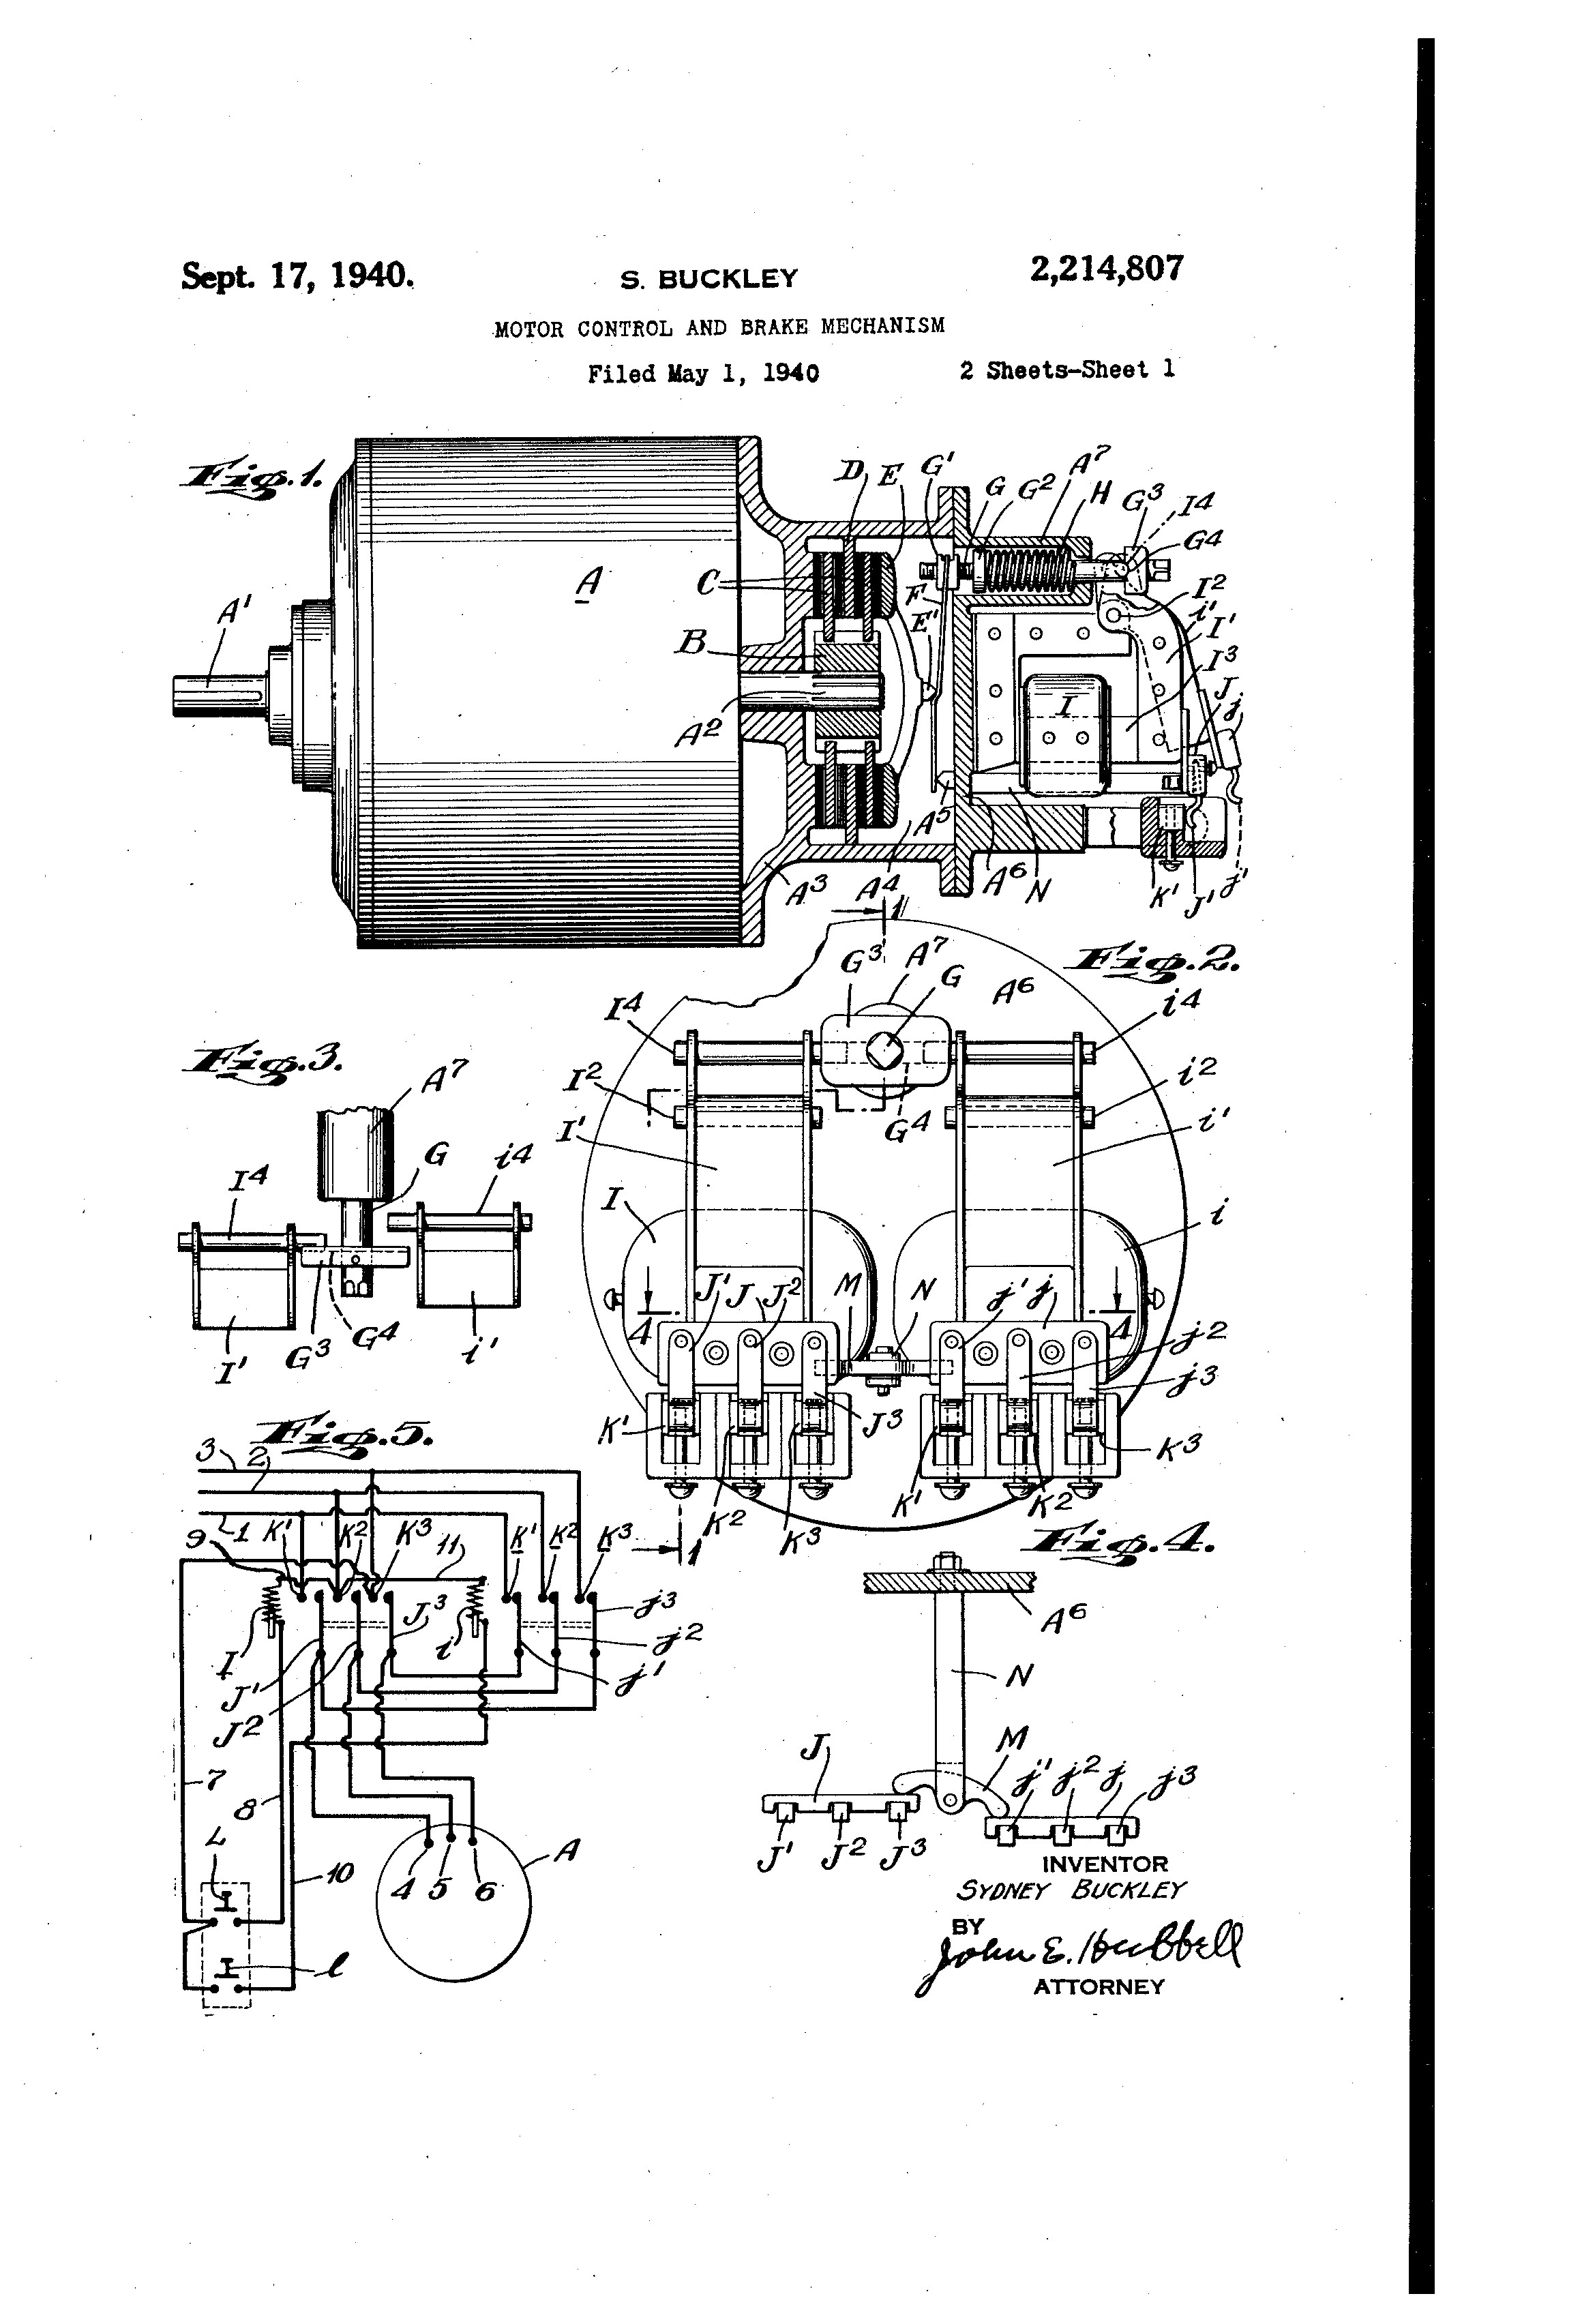 stearns motor brake wiring diagram wiring diagram. Black Bedroom Furniture Sets. Home Design Ideas